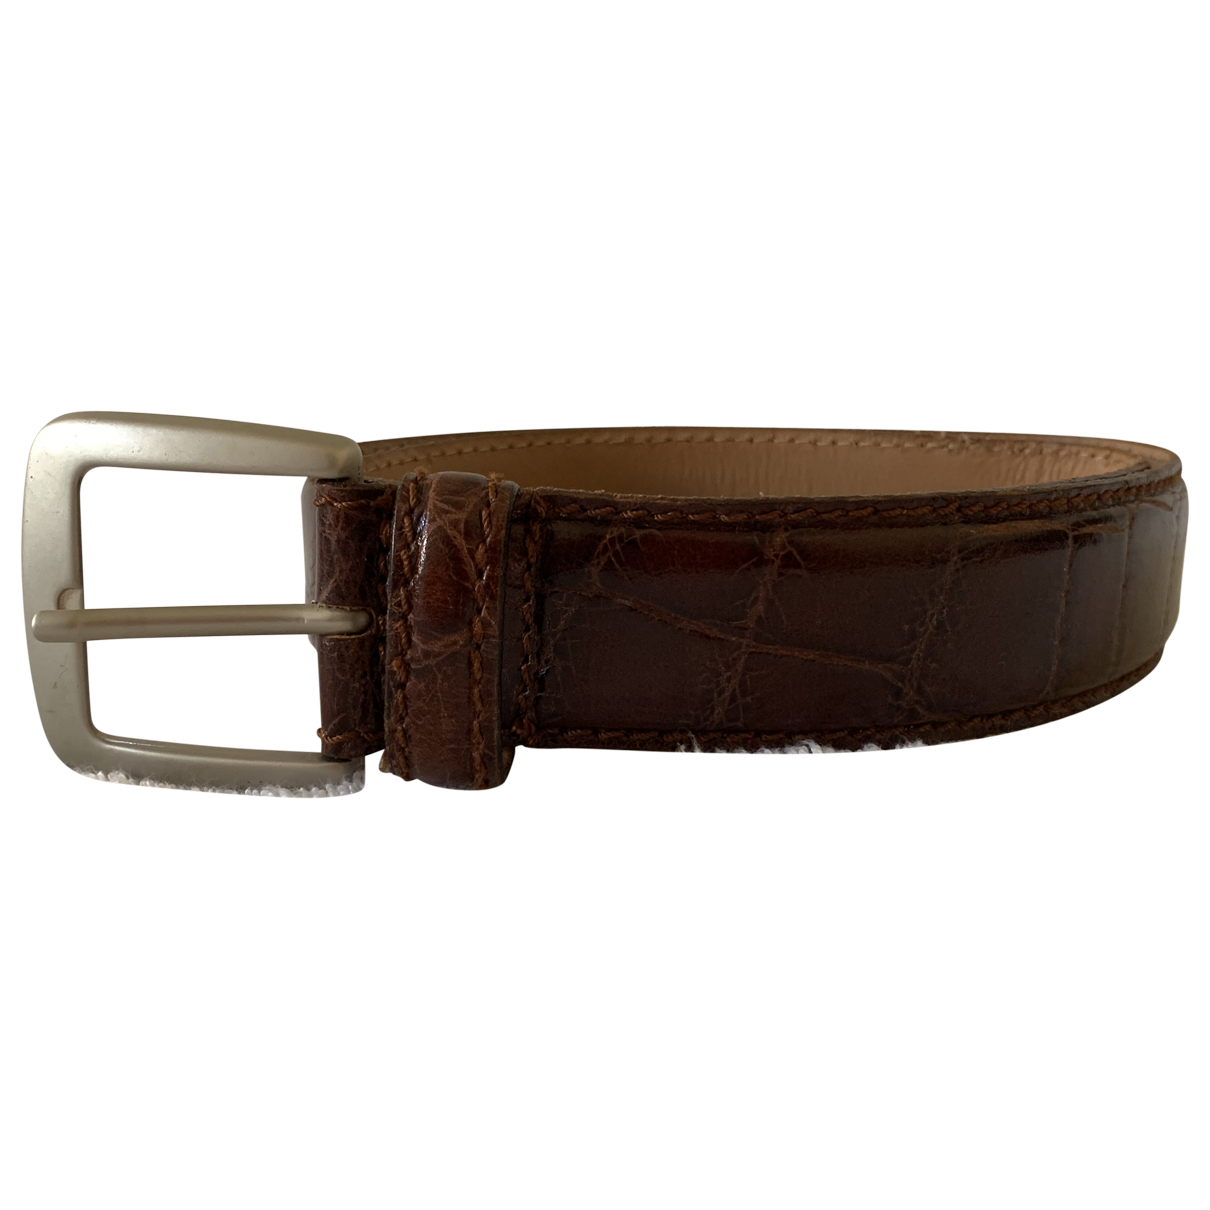 Yves Saint Laurent N Brown Leather belt for Men 90 cm